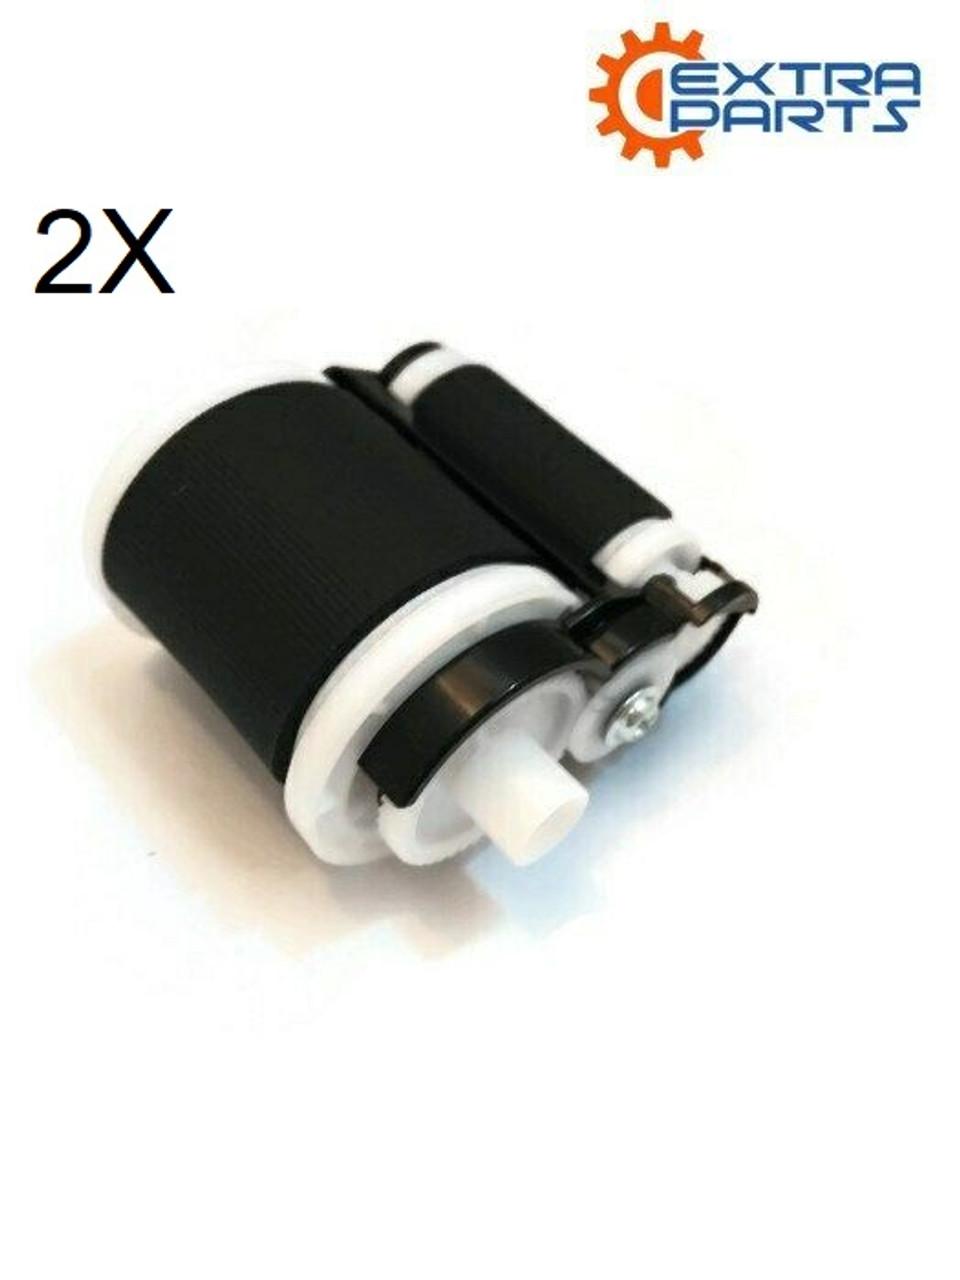 NEW Brother DCP7020 MFC7220 MFC7420 MFC7820N Cassette Pickup Roller LM4300001